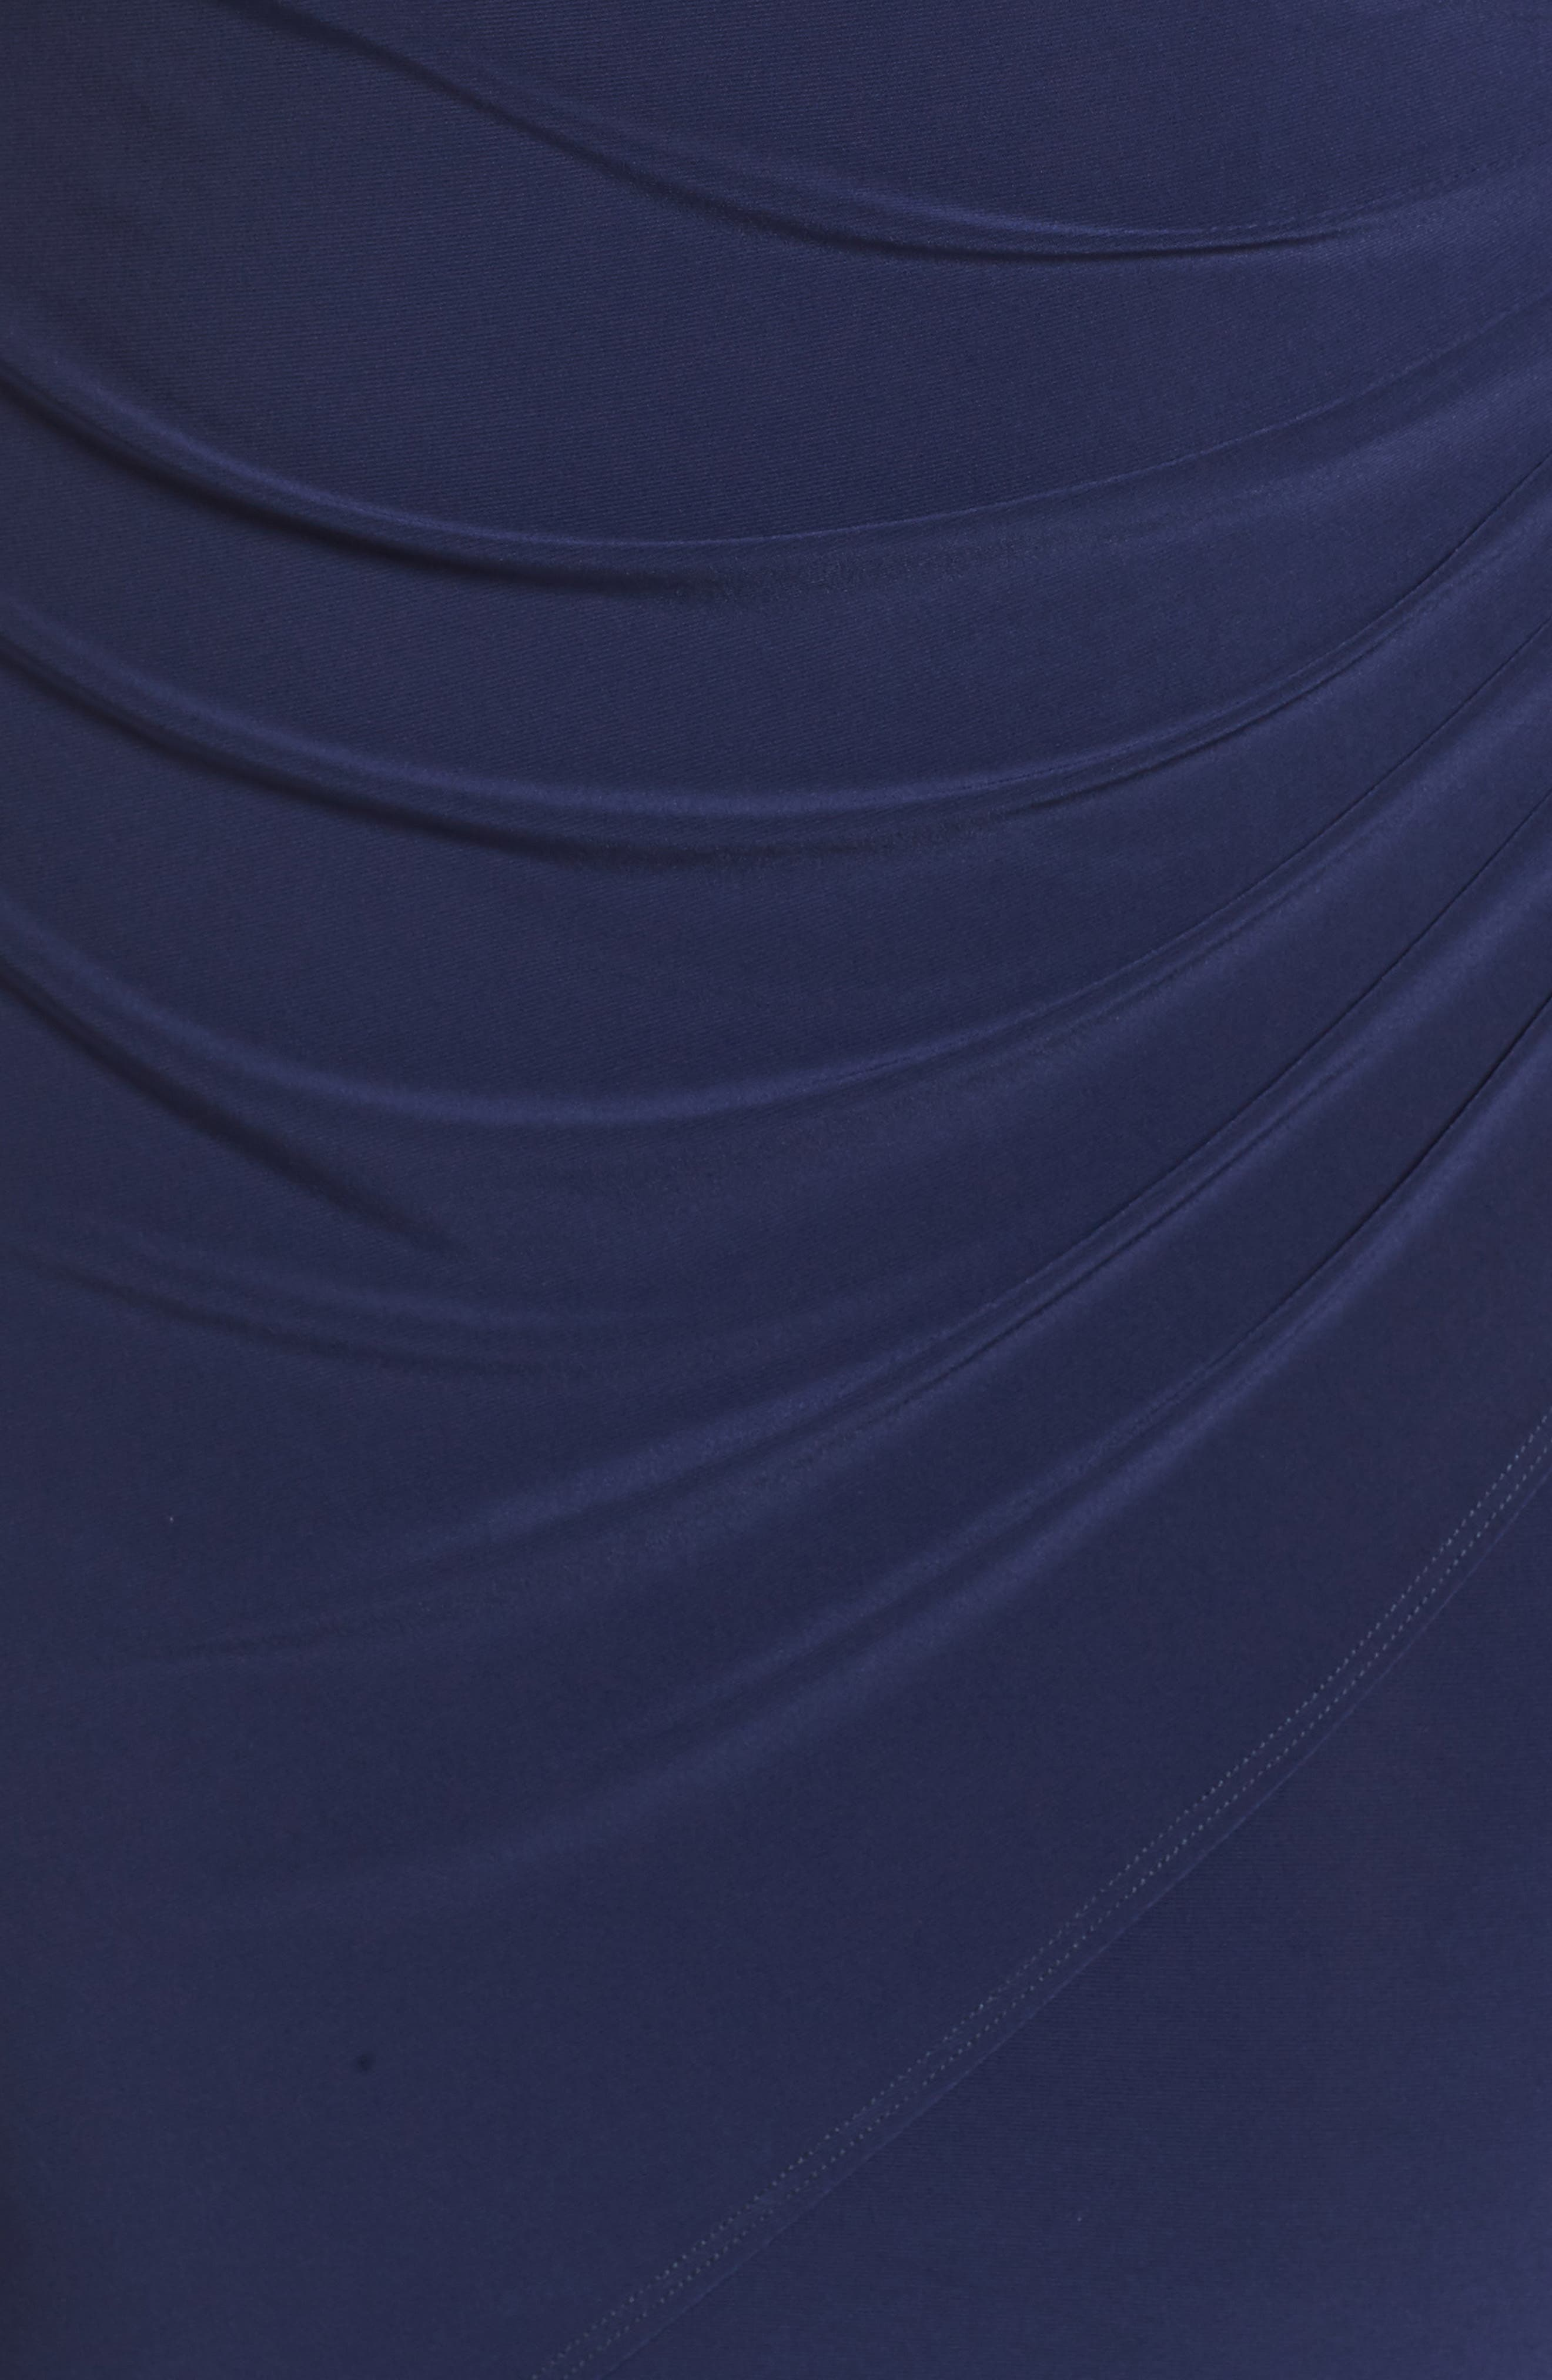 Embellished Faux Wrap Dress,                             Alternate thumbnail 7, color,                             410